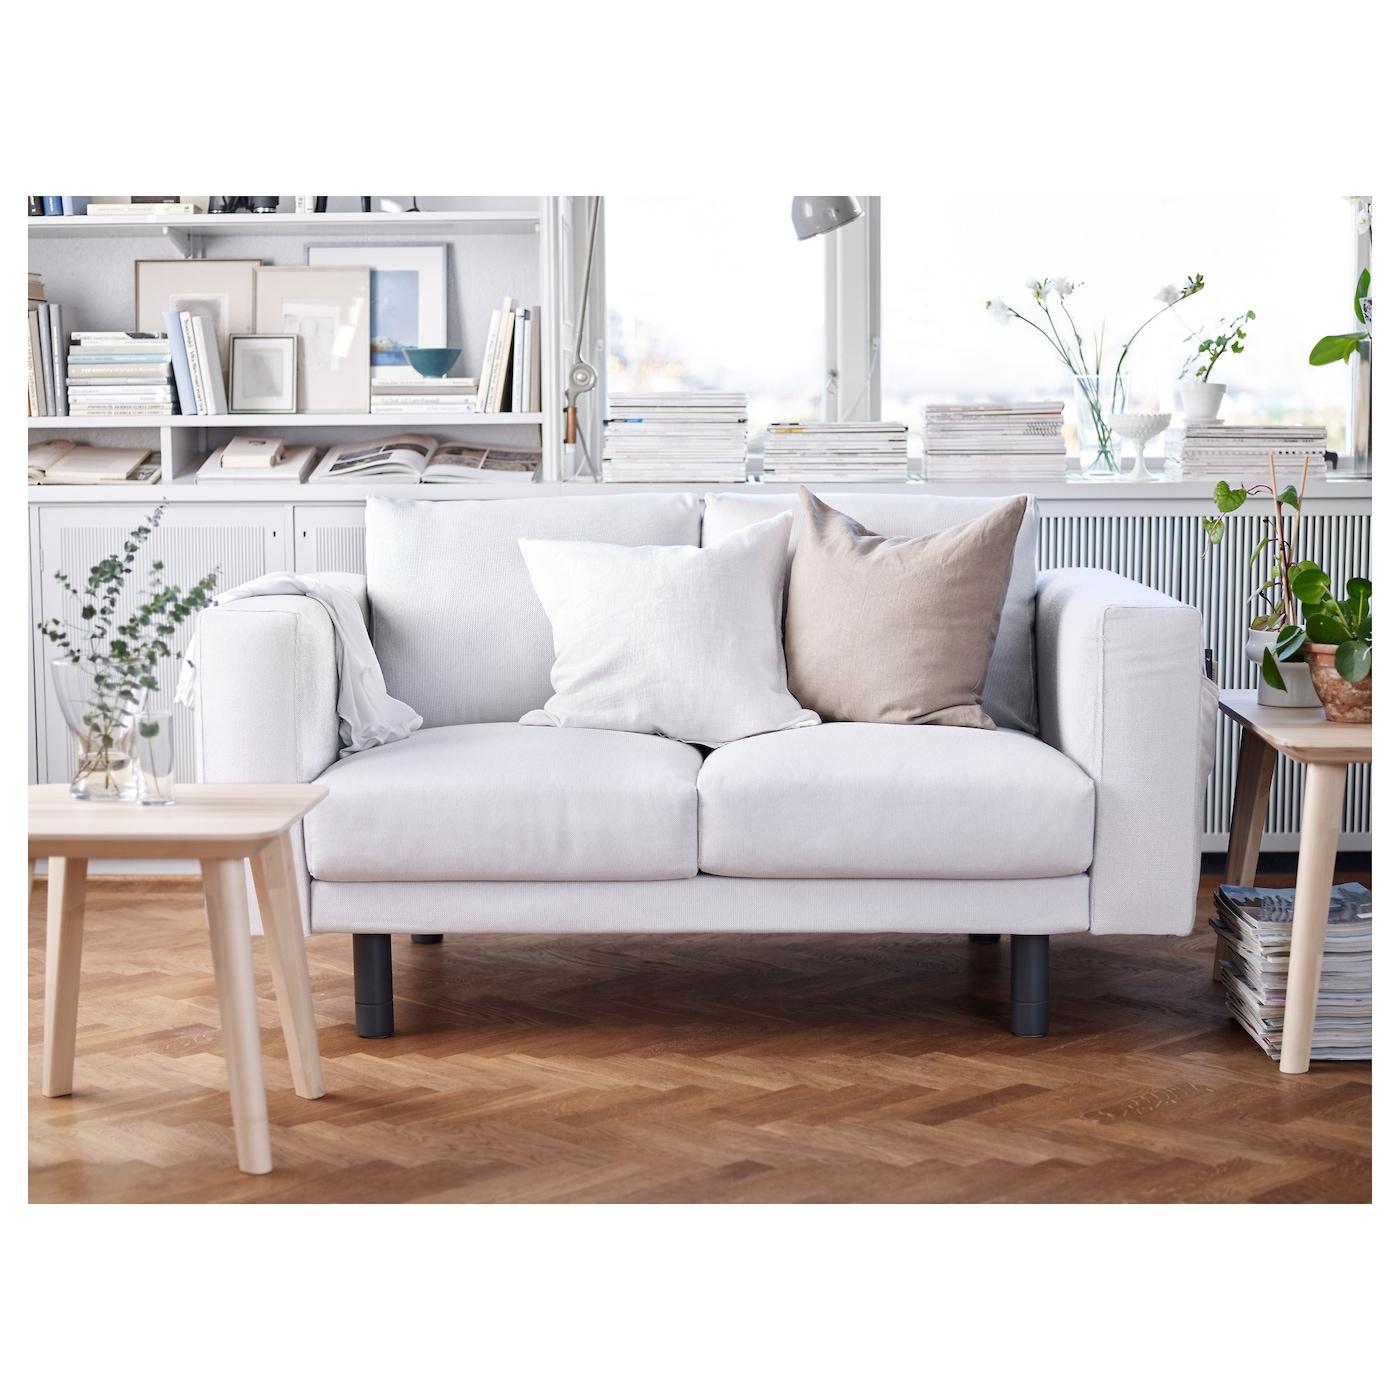 NORSBORG Two seat sofa Finnsta white grey IKEA